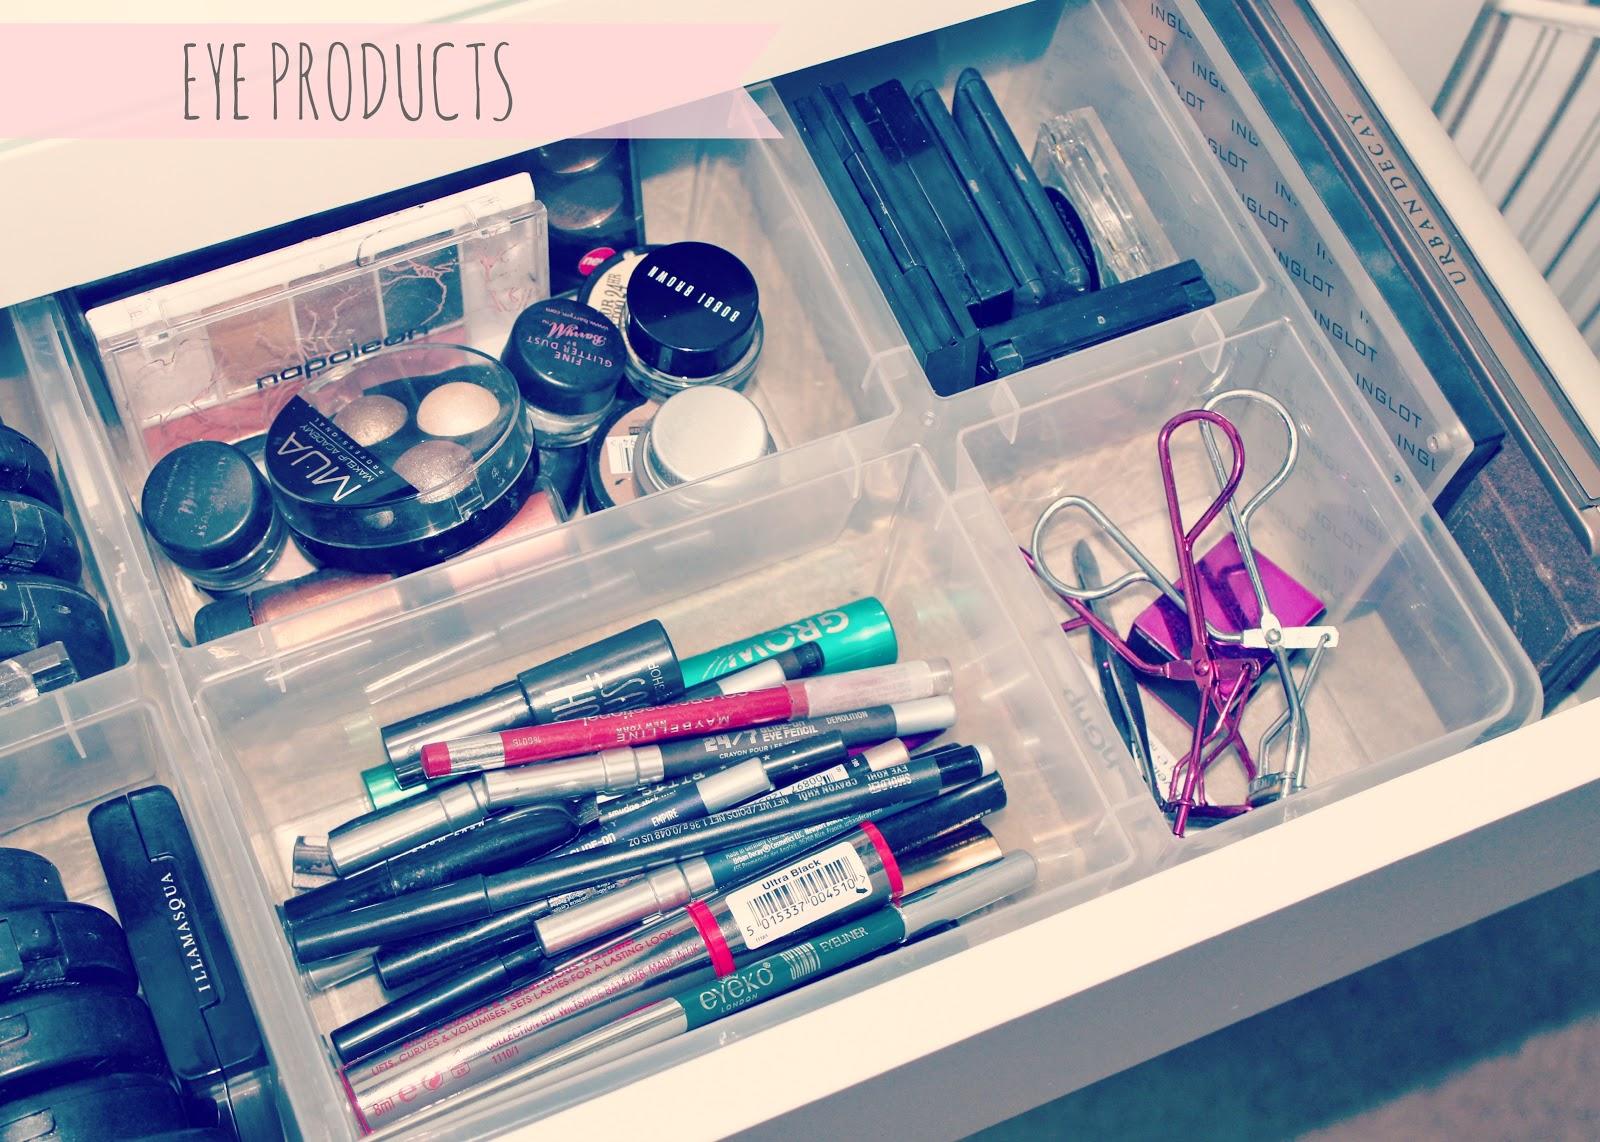 Ikea malm dressing table ikea antonius basket inserts makeup storage - My Makeup Storage Ikea Malm Dressing Table Sweet